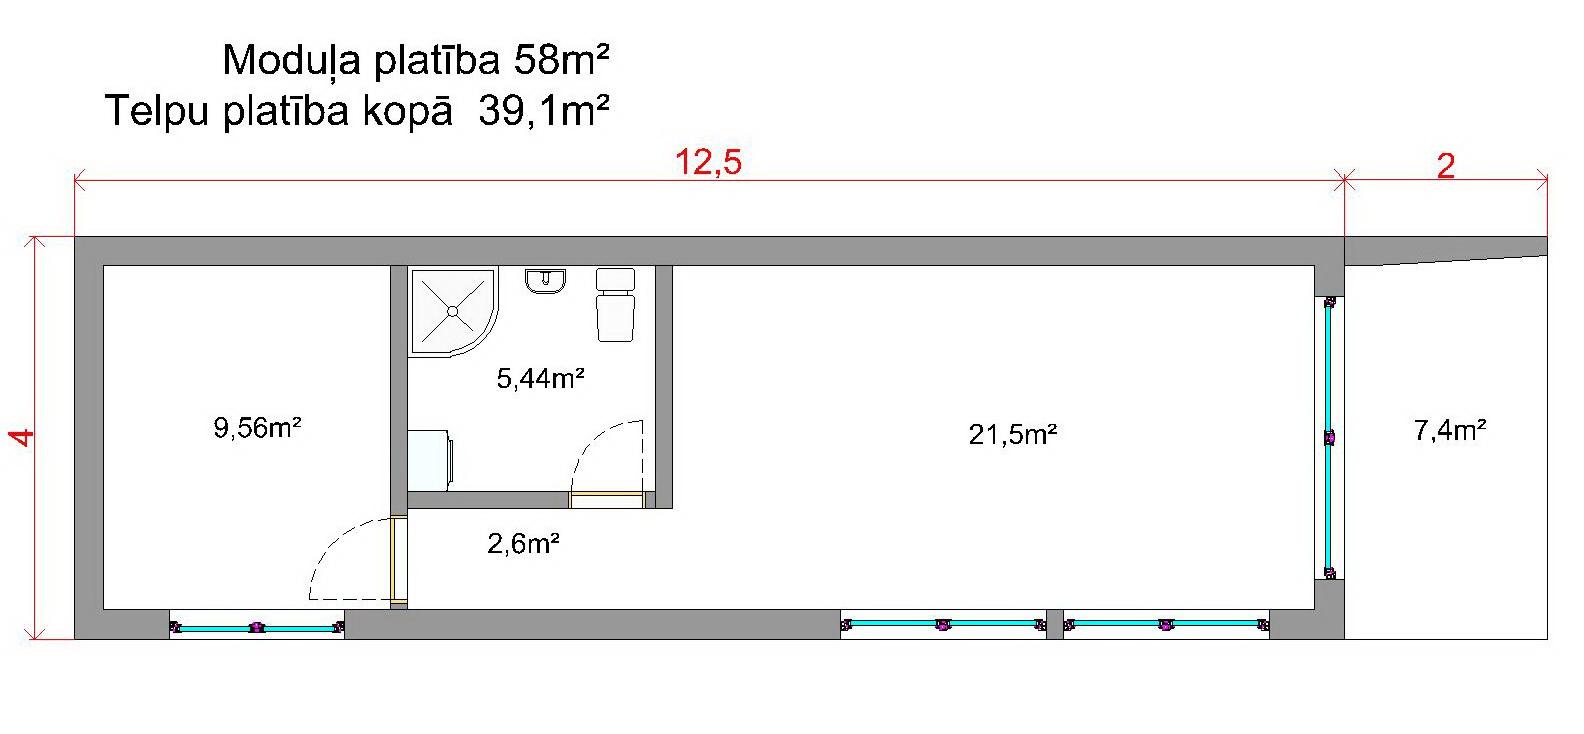 modular houses planing